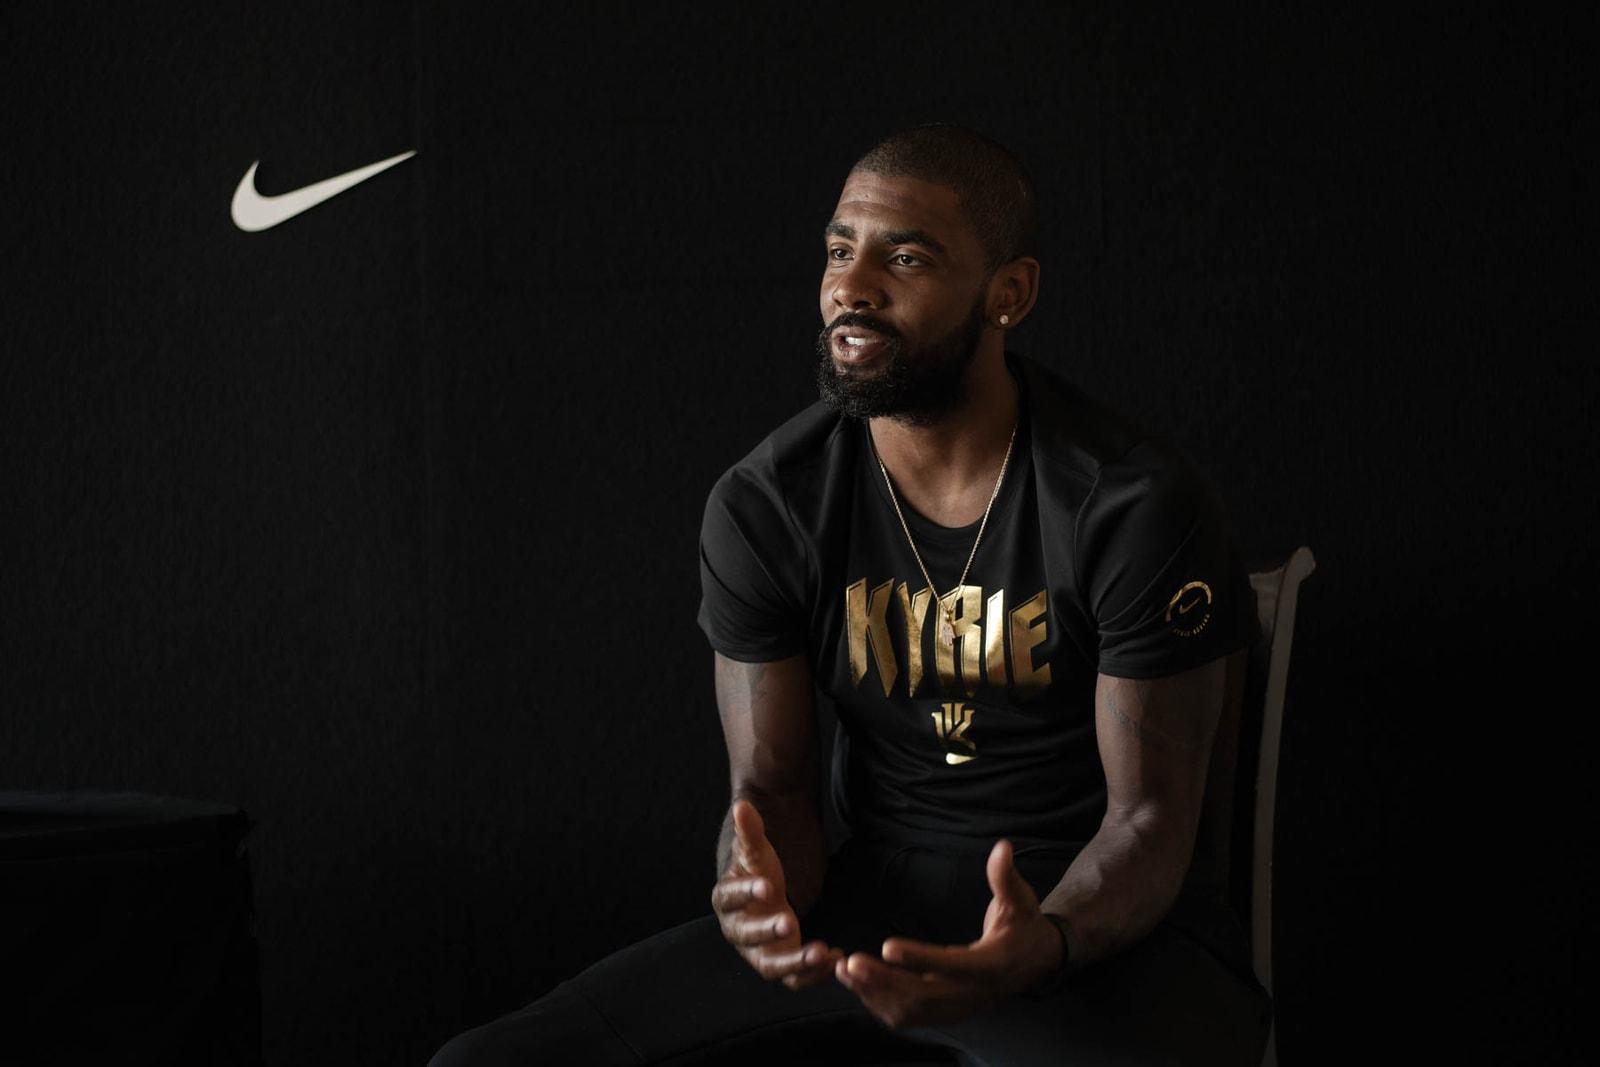 Interviews: 初来日を果たした現役屈指のクラッチプレーヤー カイリー・アービング インタビュー NBA バスケットボール キャバリアーズ キャブス Cavs  Kyrie Irving